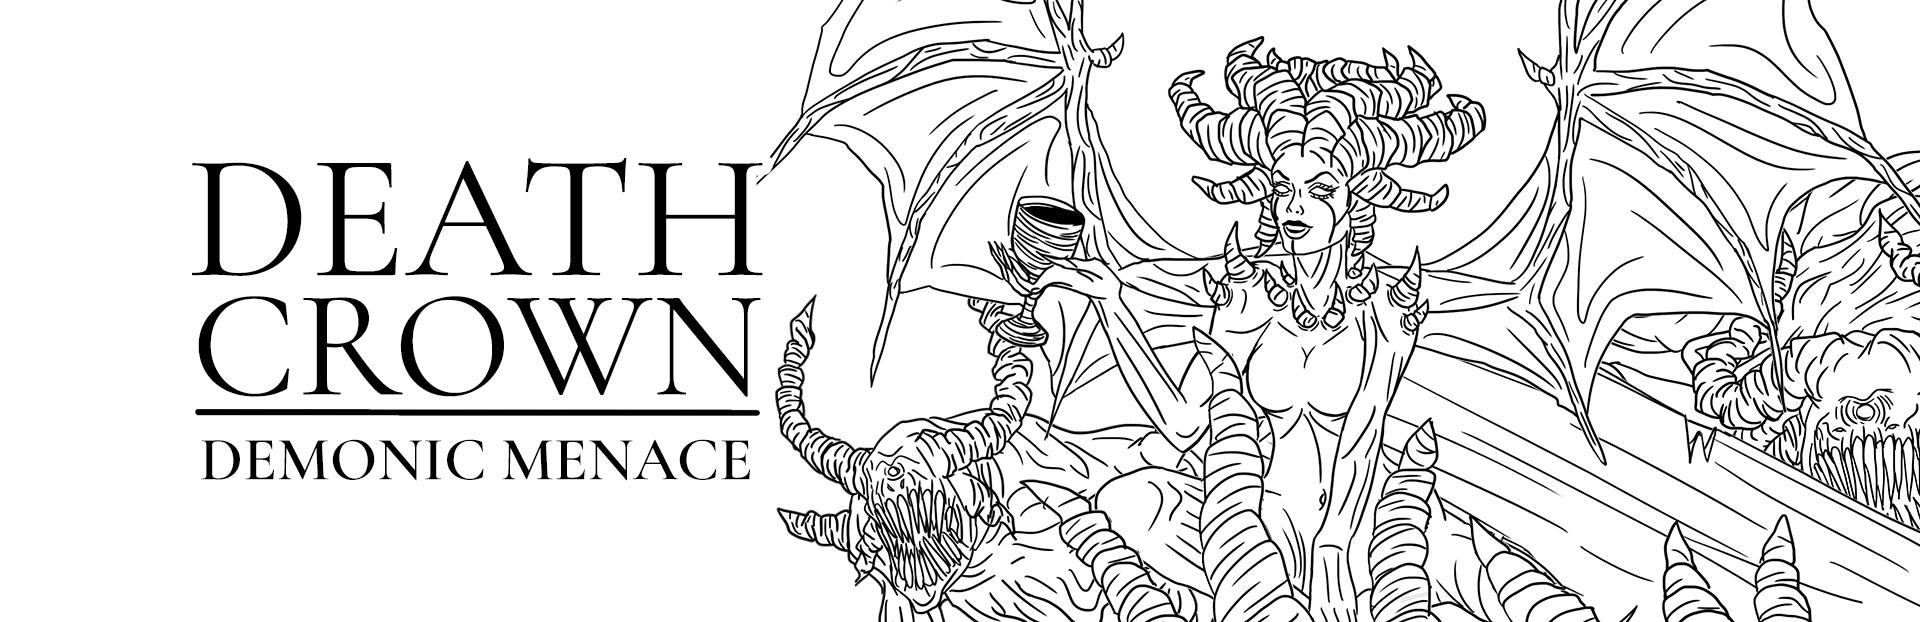 Death Crown — Demonic Menace DLC (standalone version)